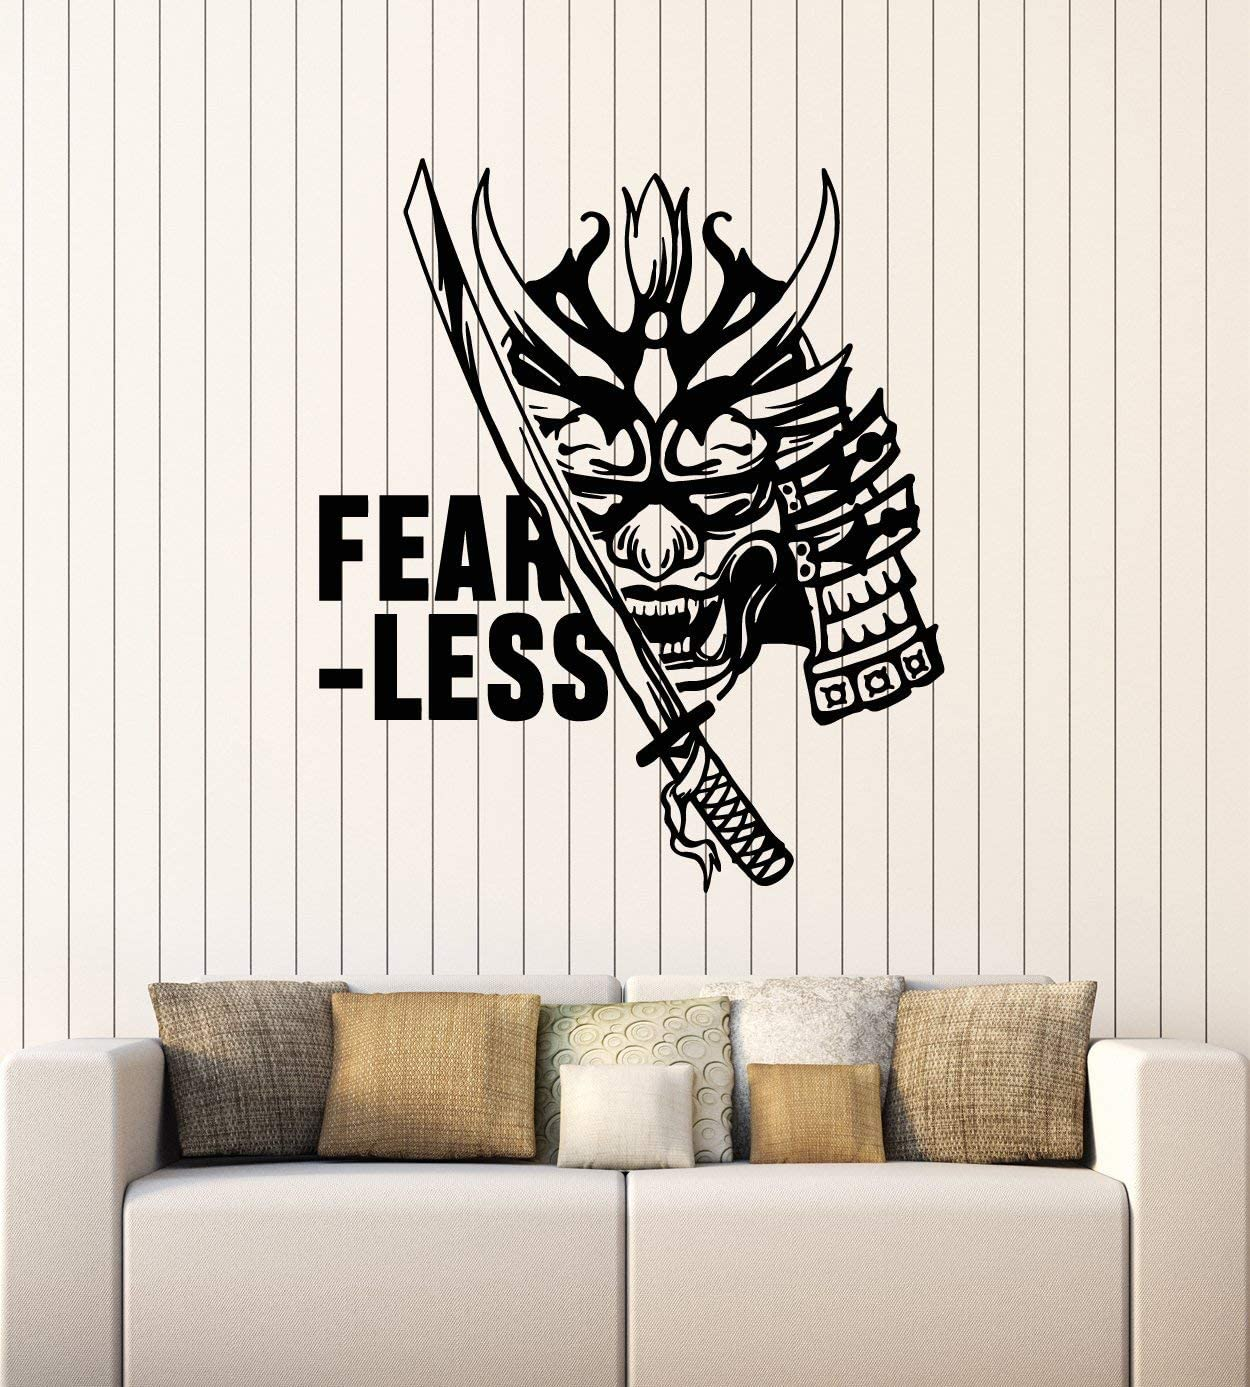 Vinyl Wall Decal Samurai Japanese Fearless Warrior Face Mask Catana Stickers Mural Large Decor (g2692) Black